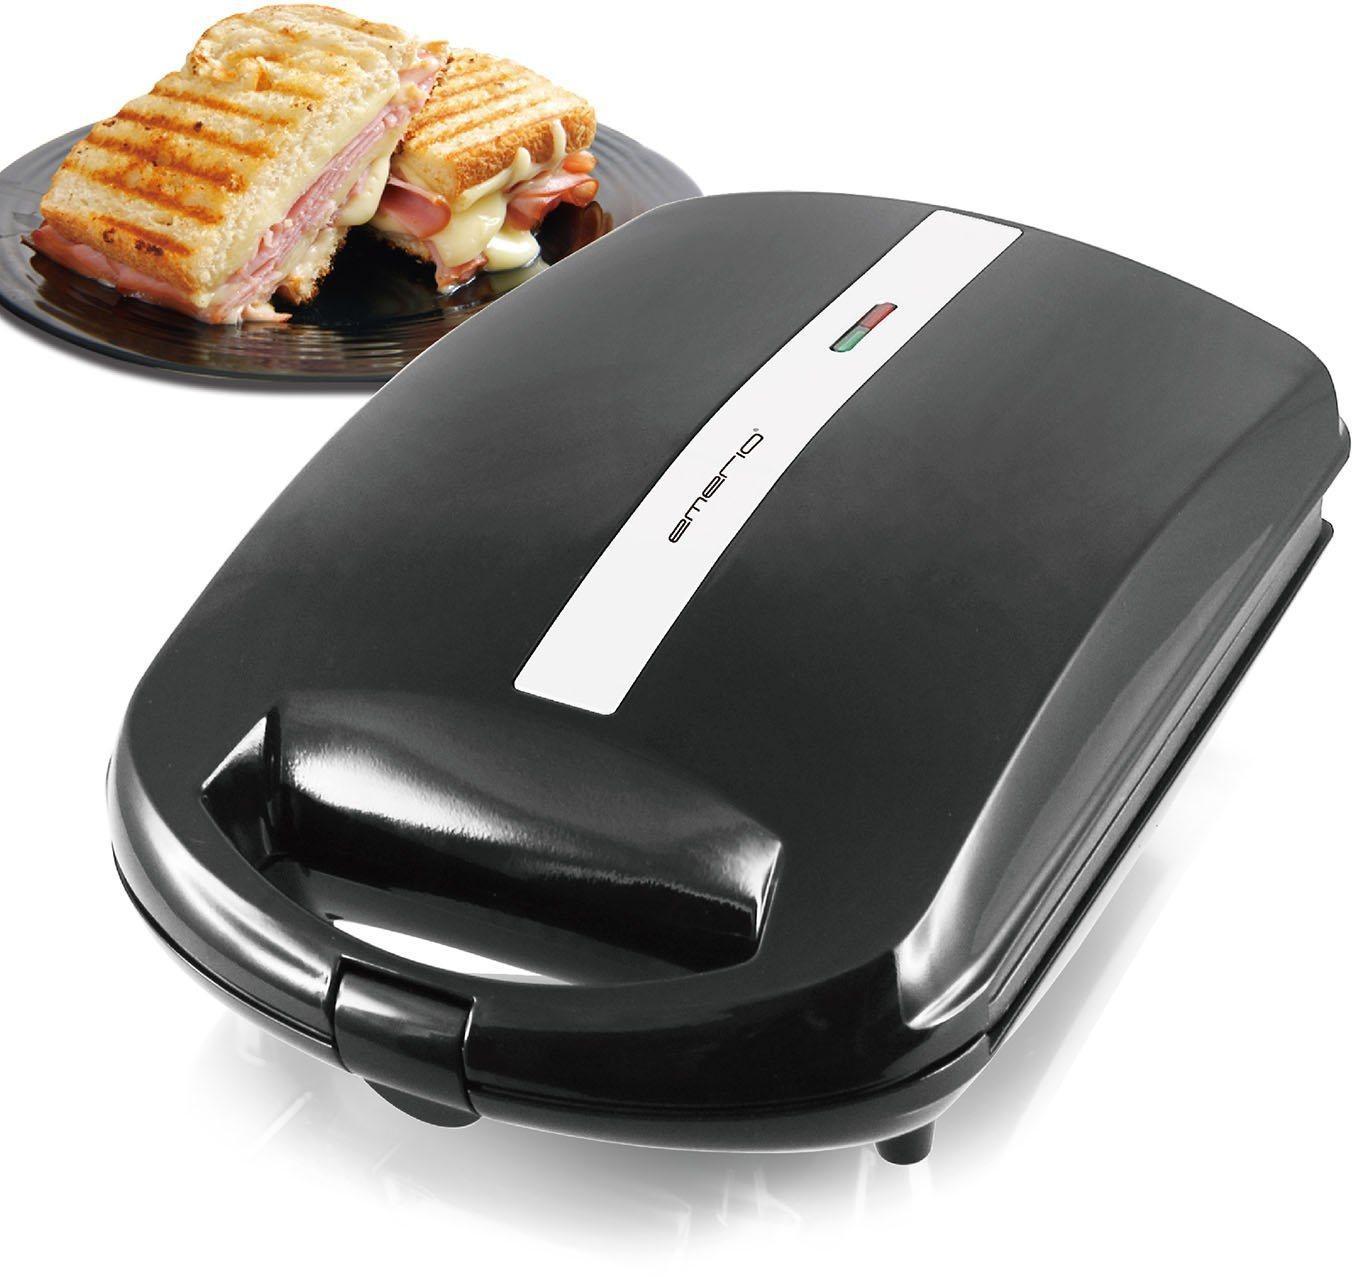 Emerio Sandwichmaker ST-111153 FAMILY, 1300 W